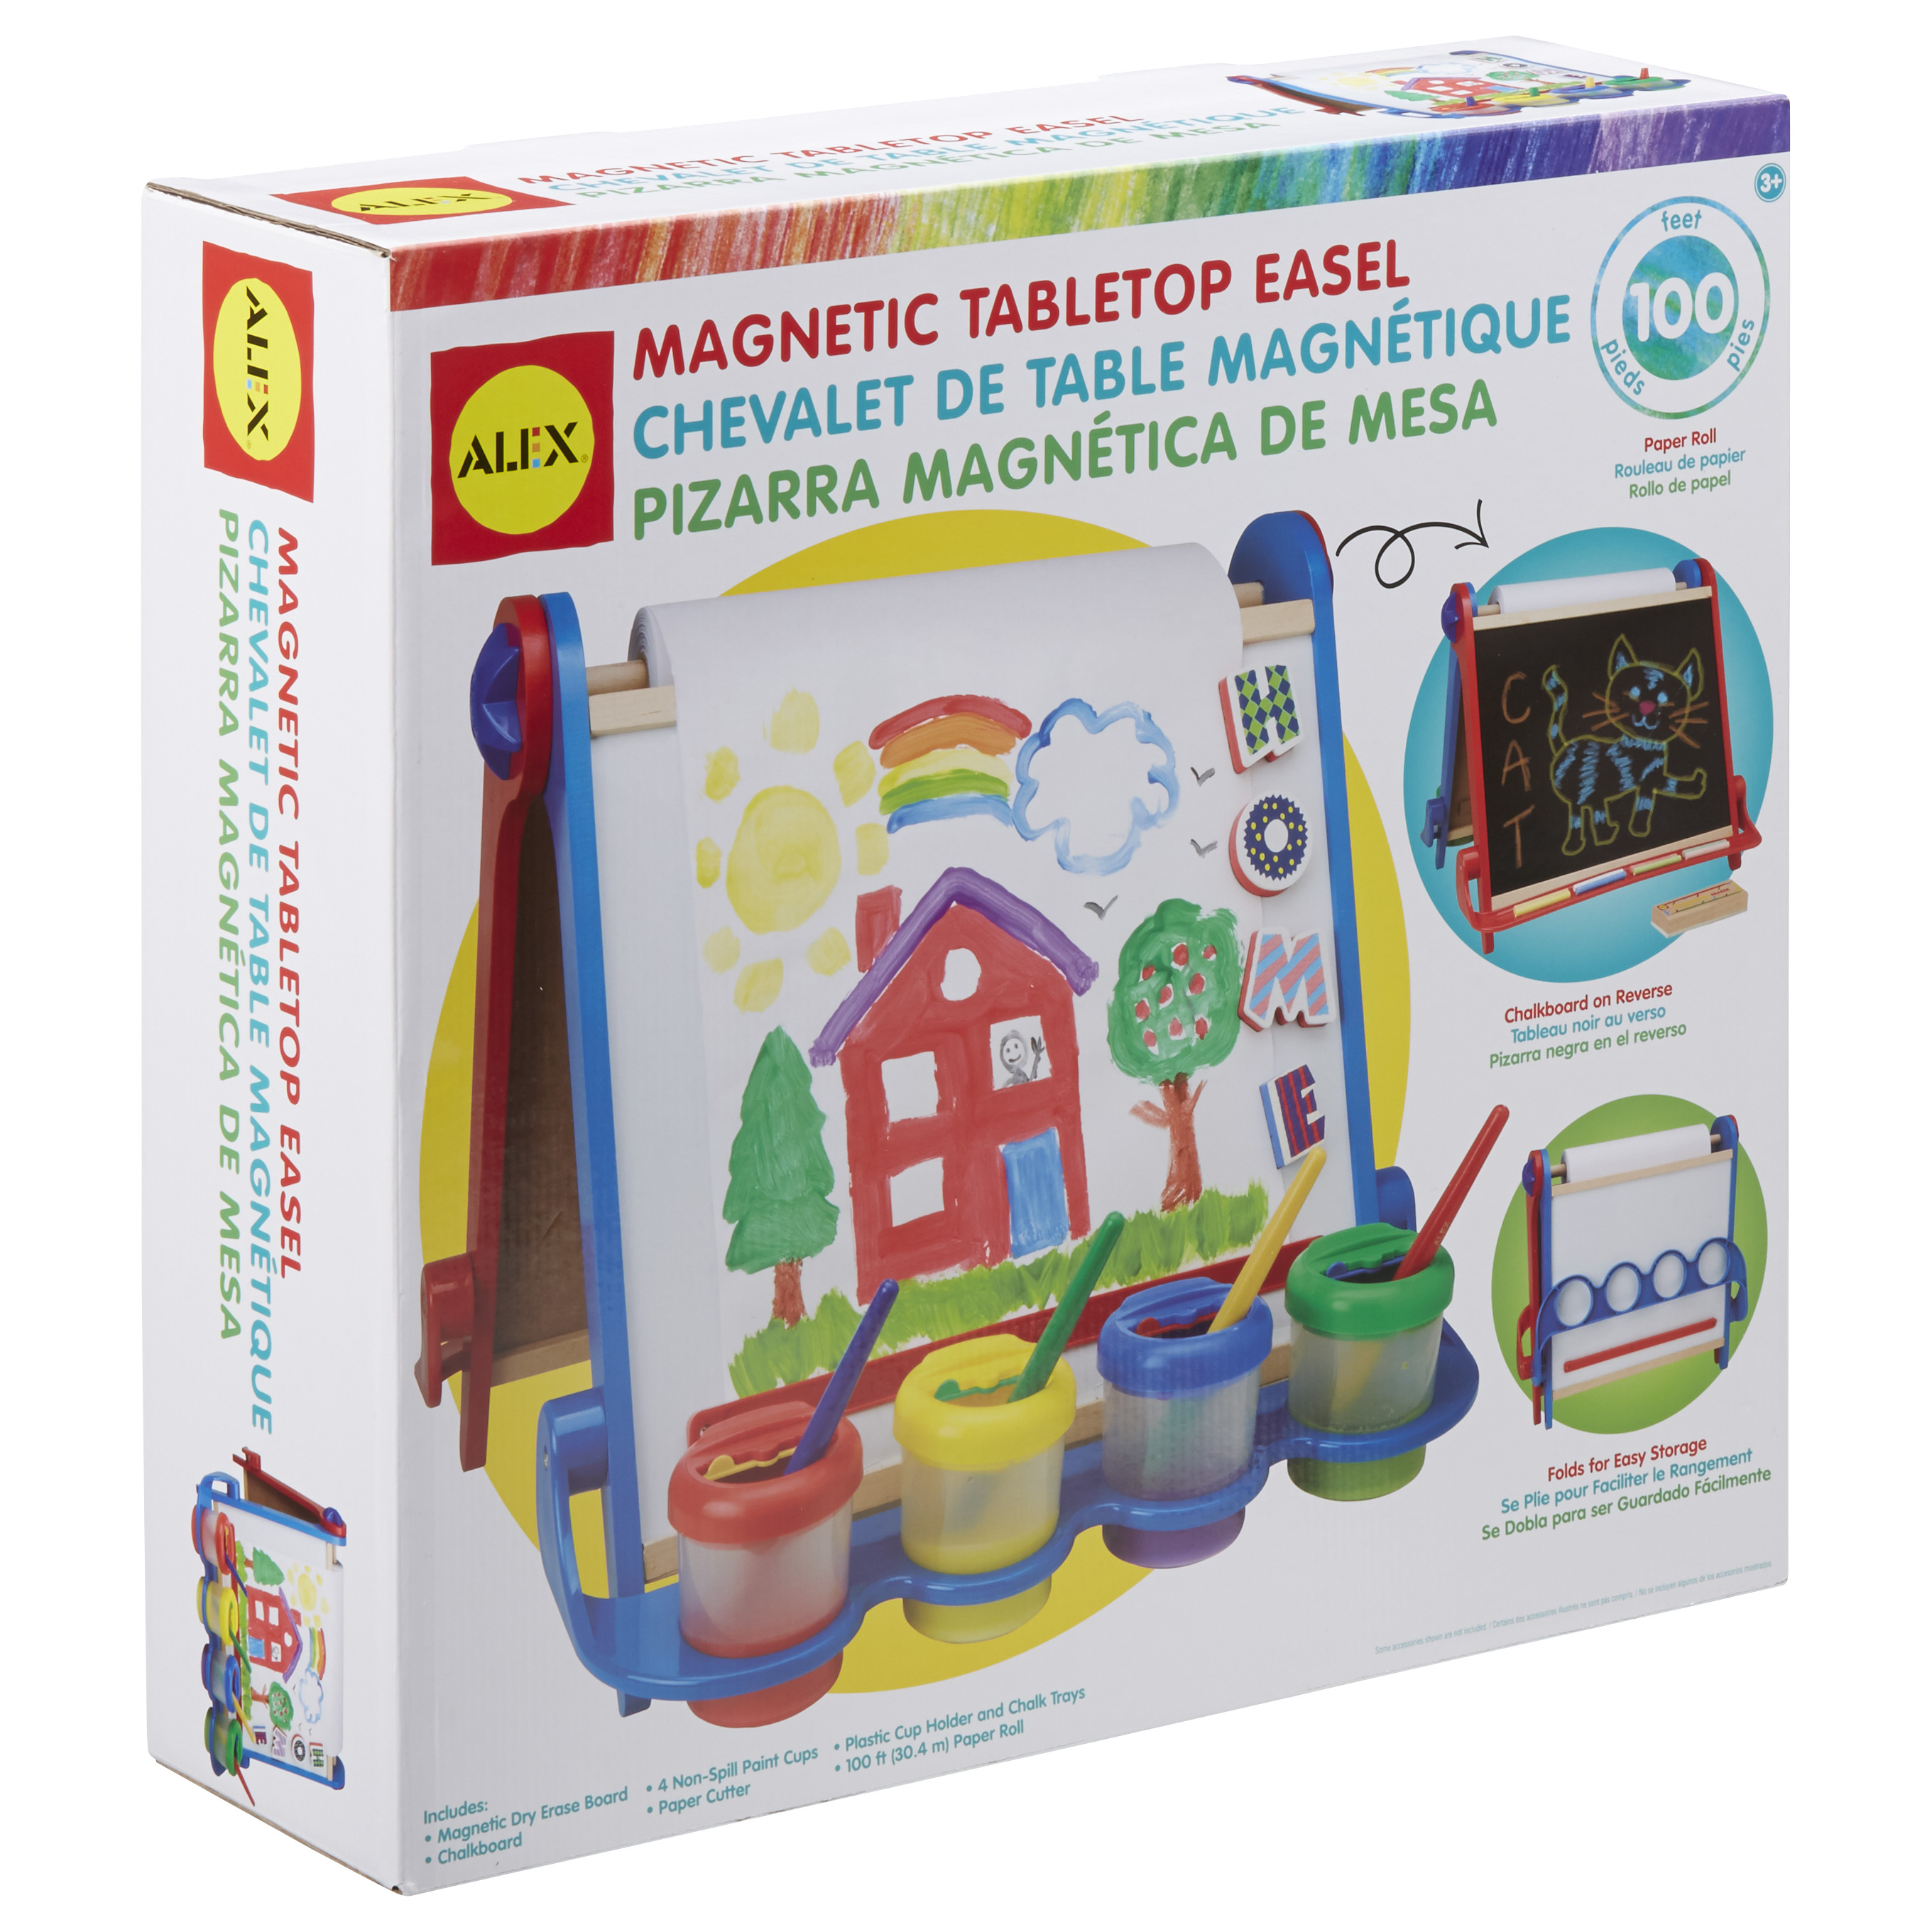 ALEX Toys Artist Studio Magnetic Tabletop Easel